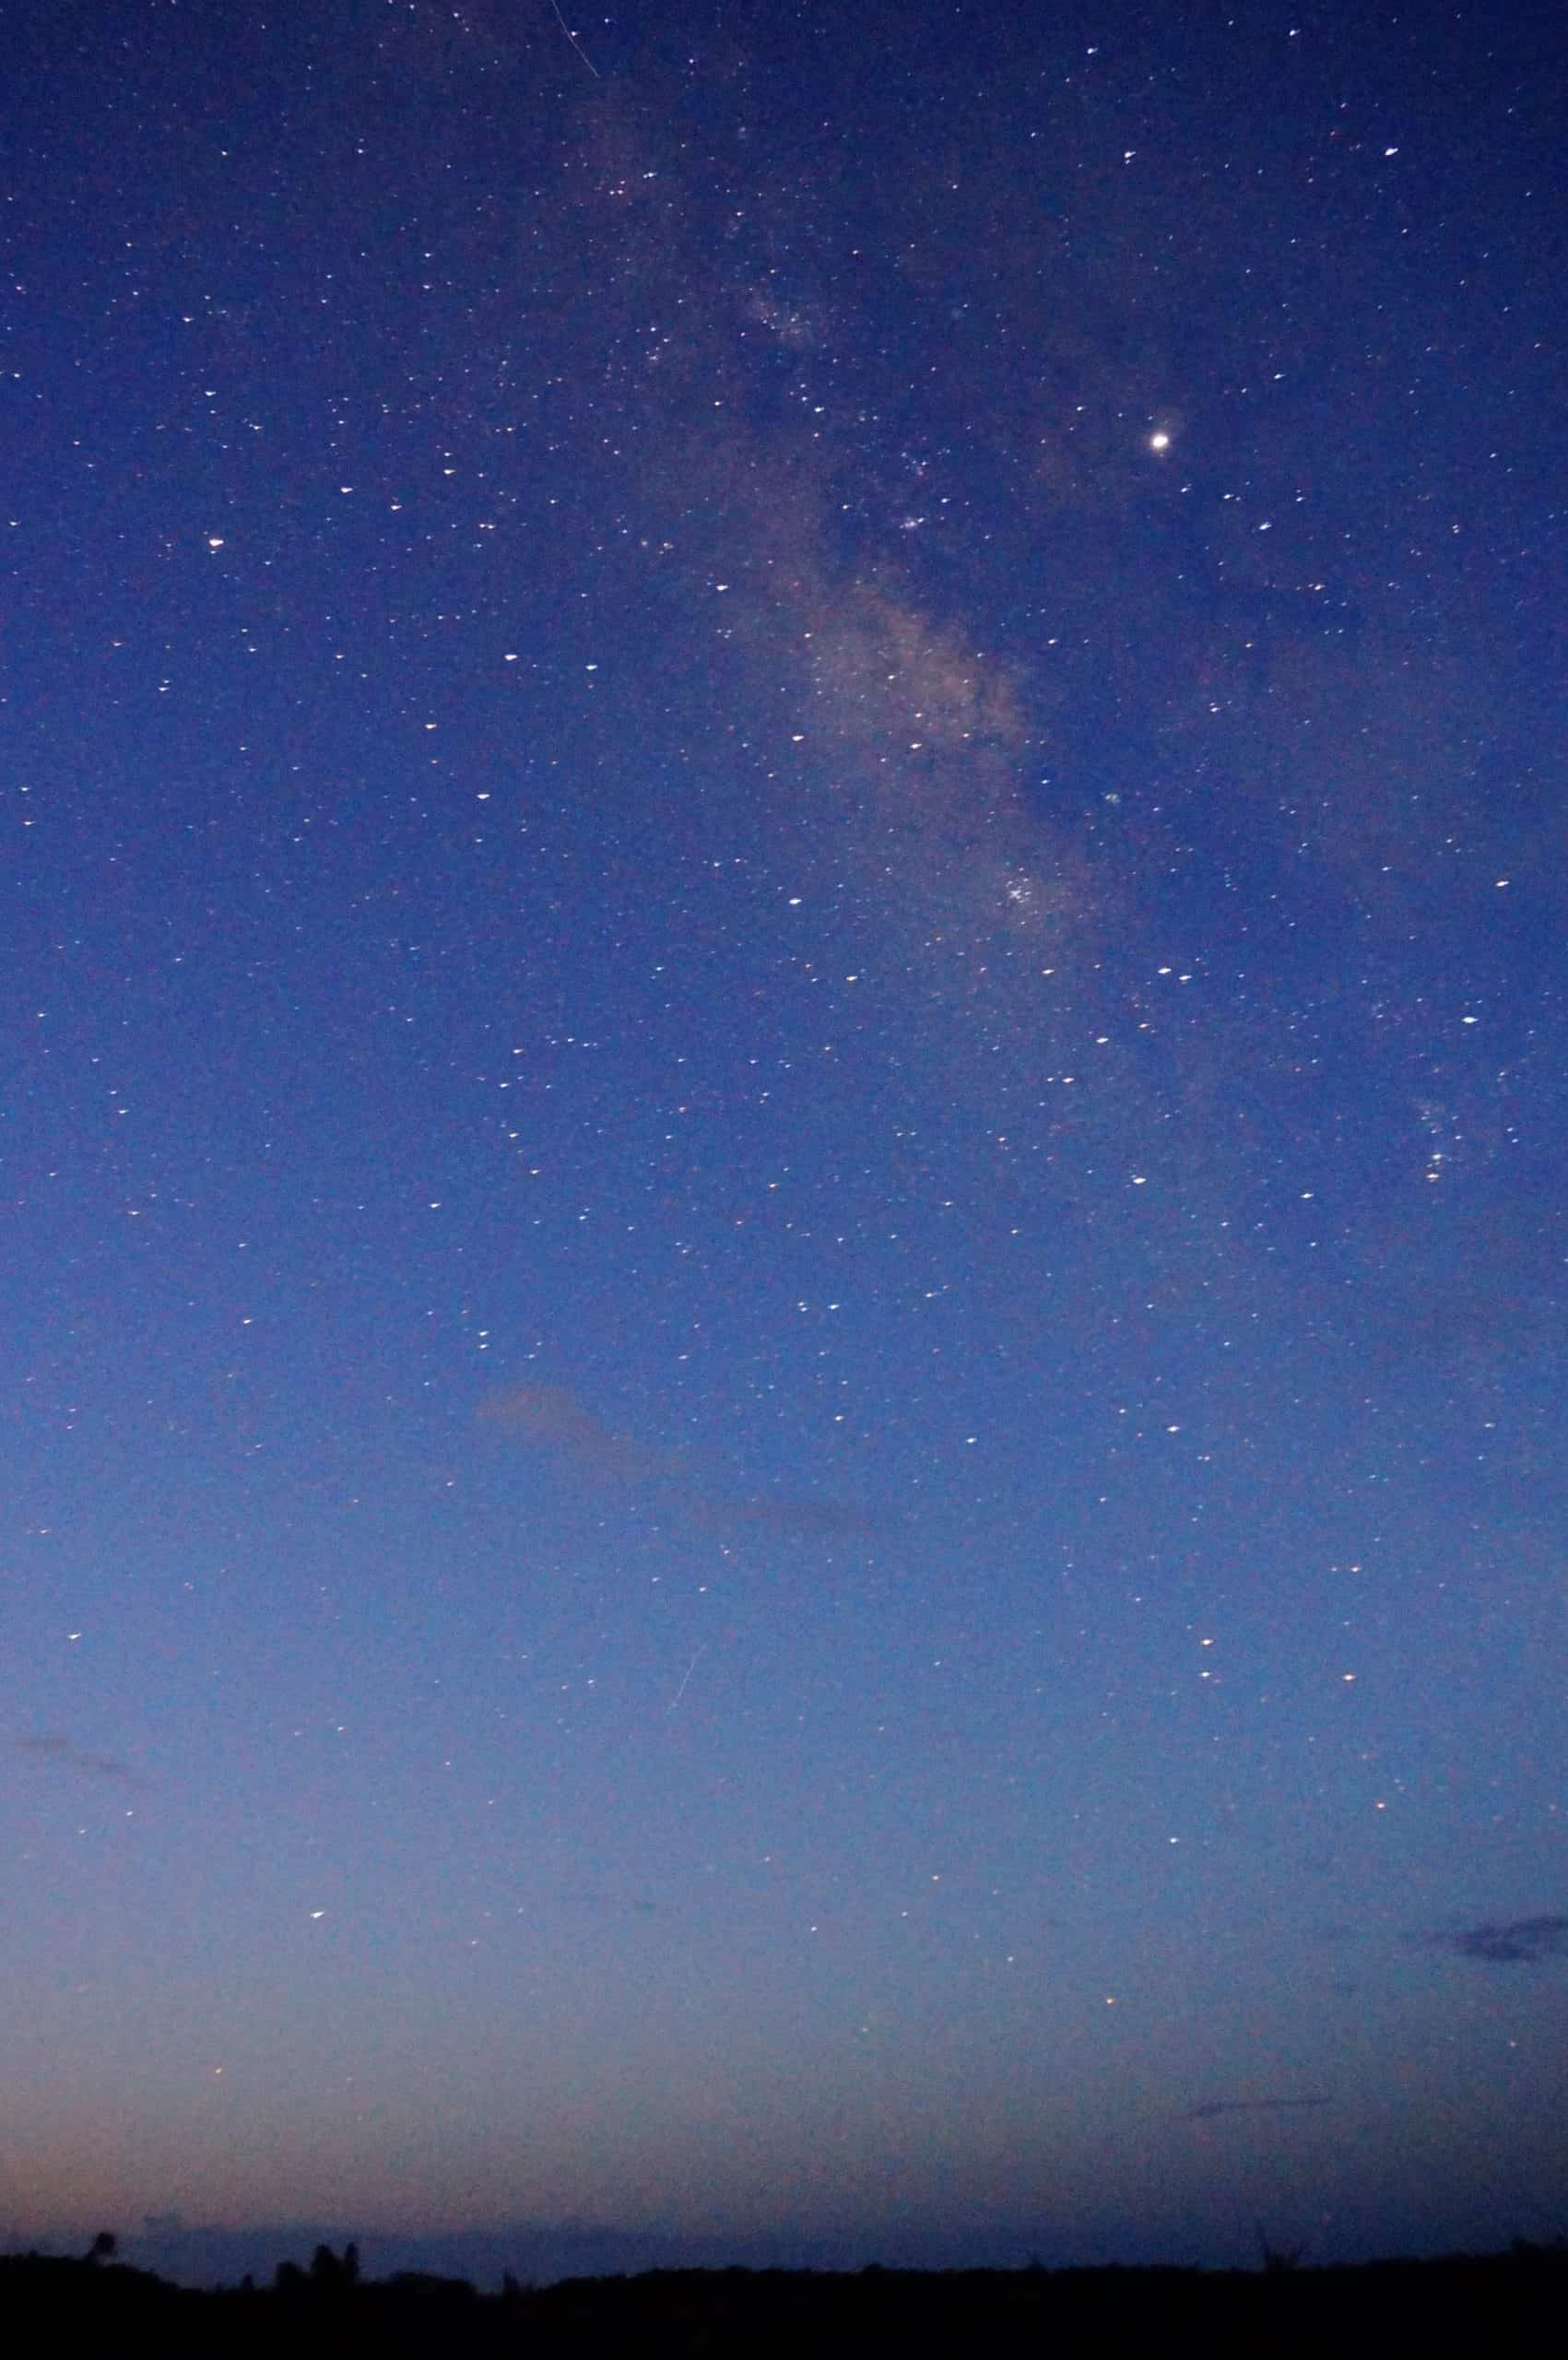 Stargazing in Hawaii - Milky Way